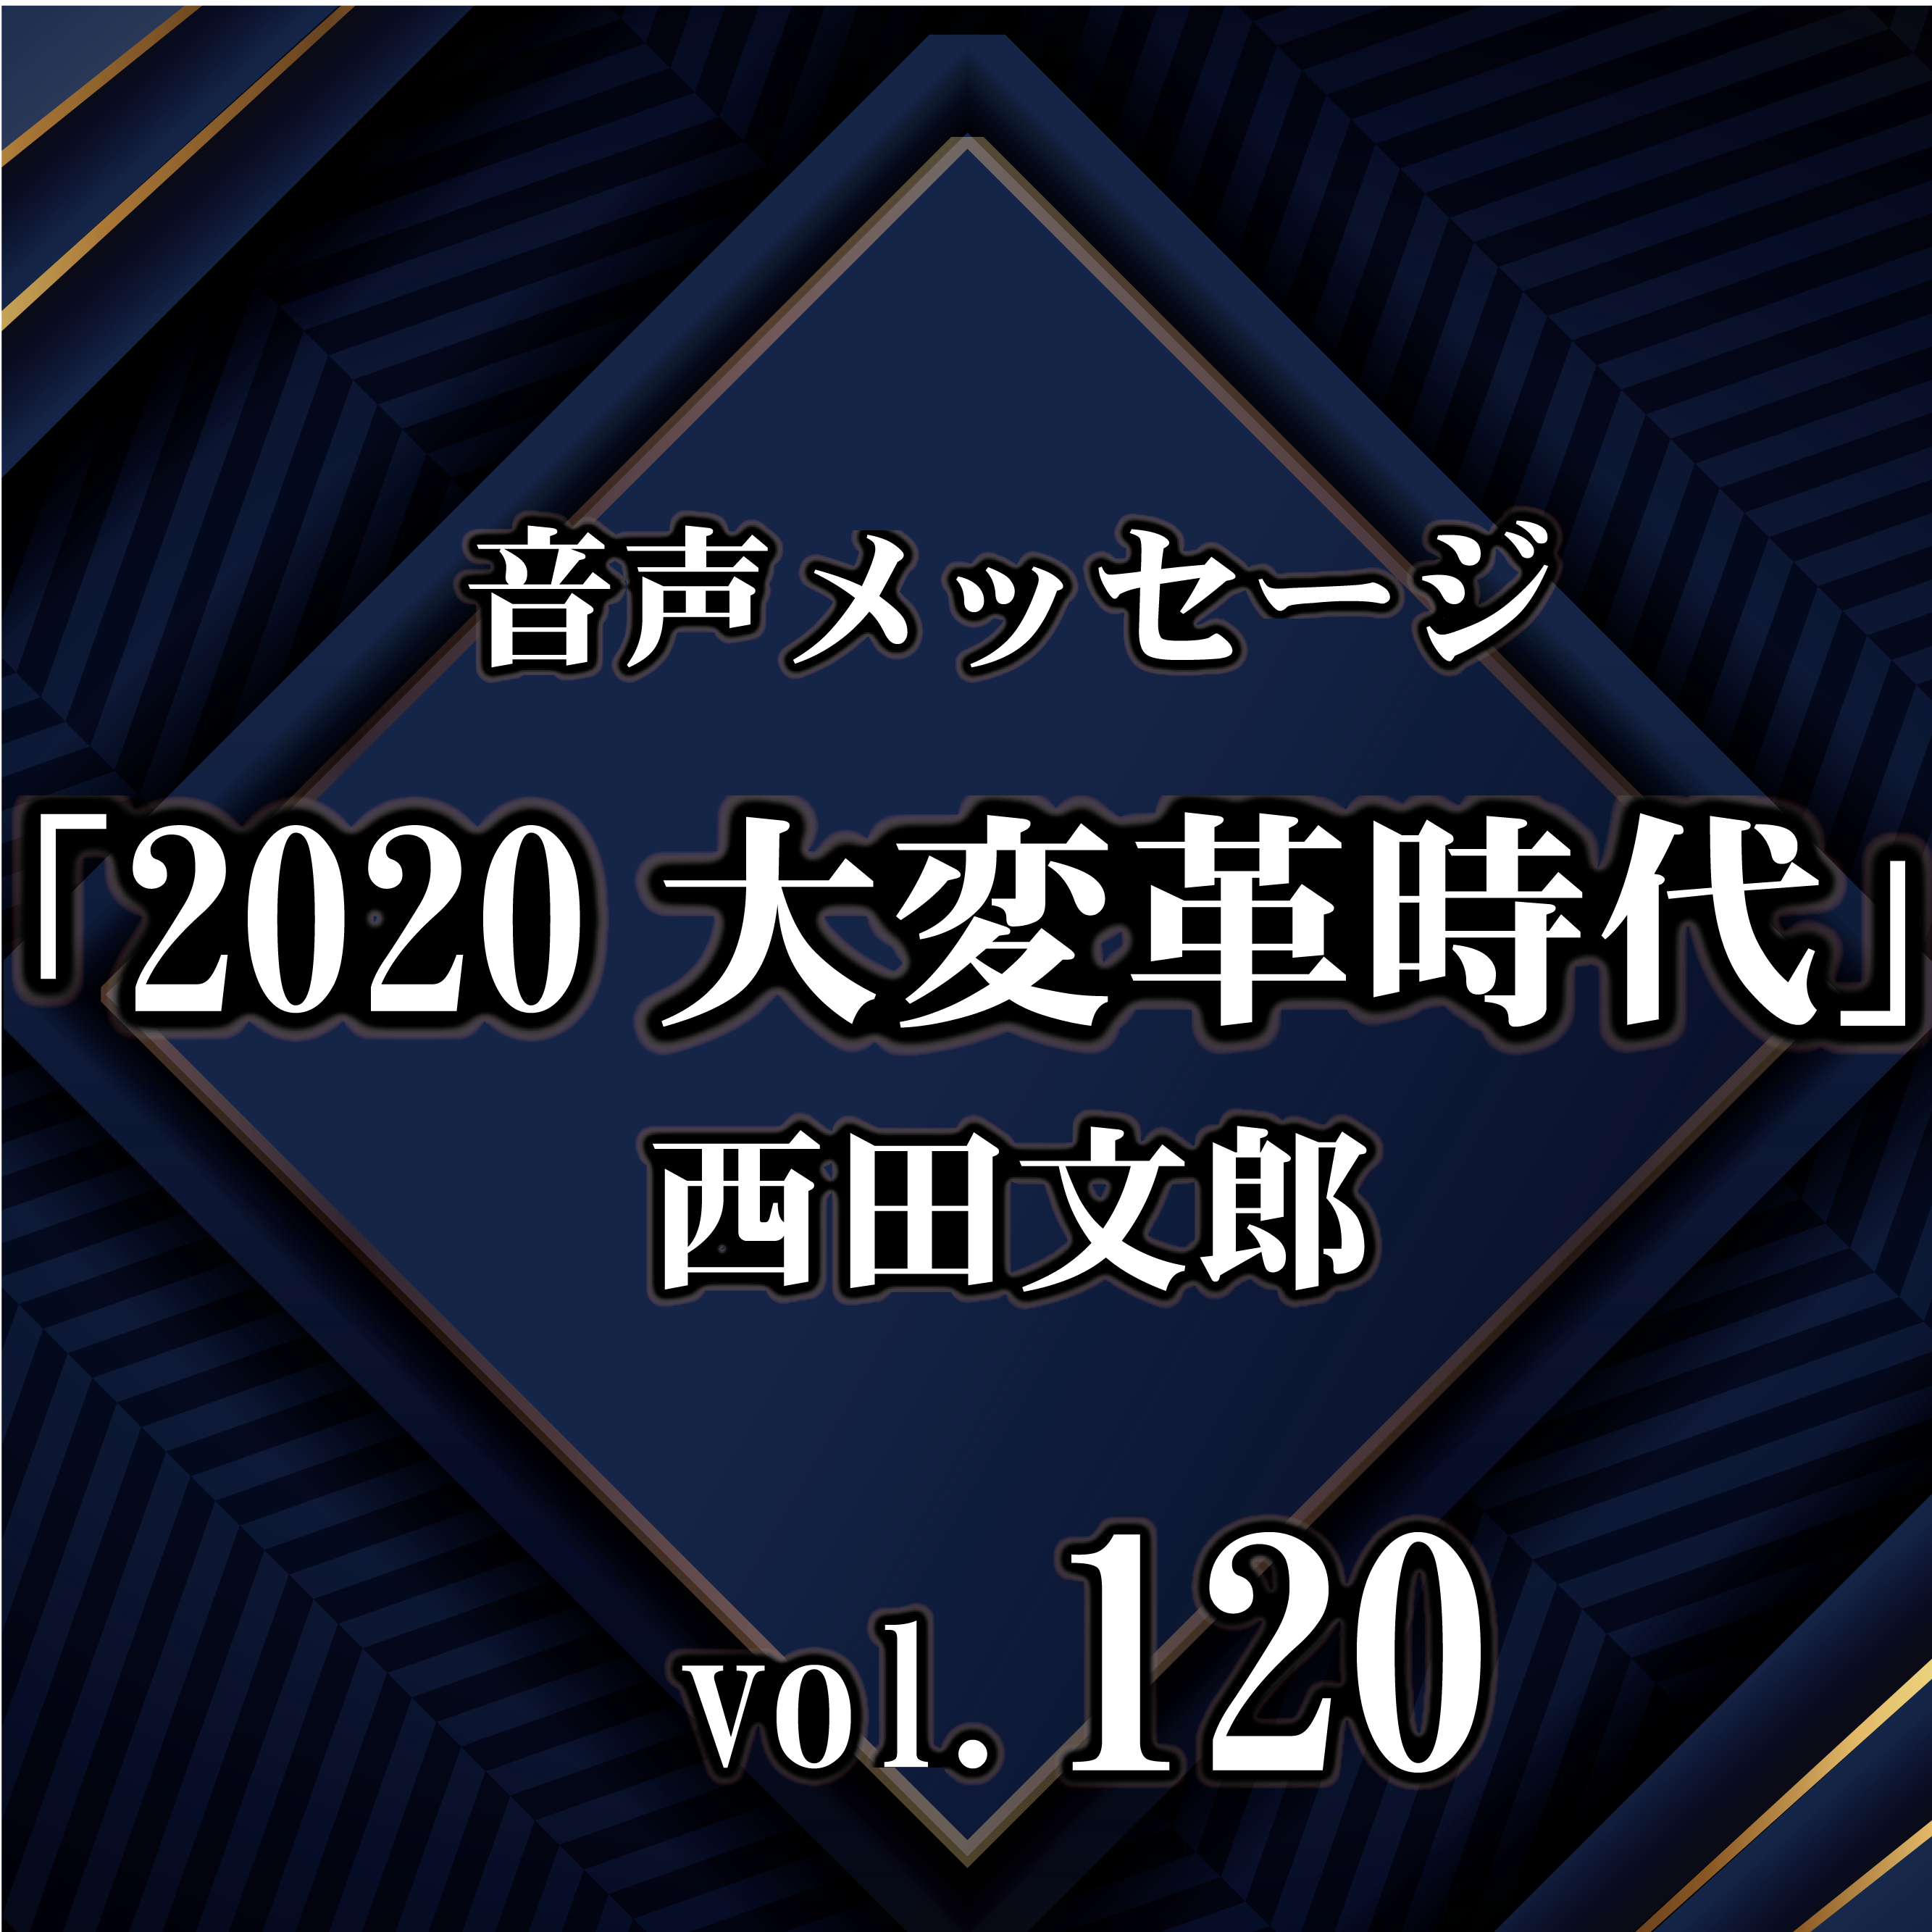 西田文郎 音声メッセージvol.120『2020大変革時代』